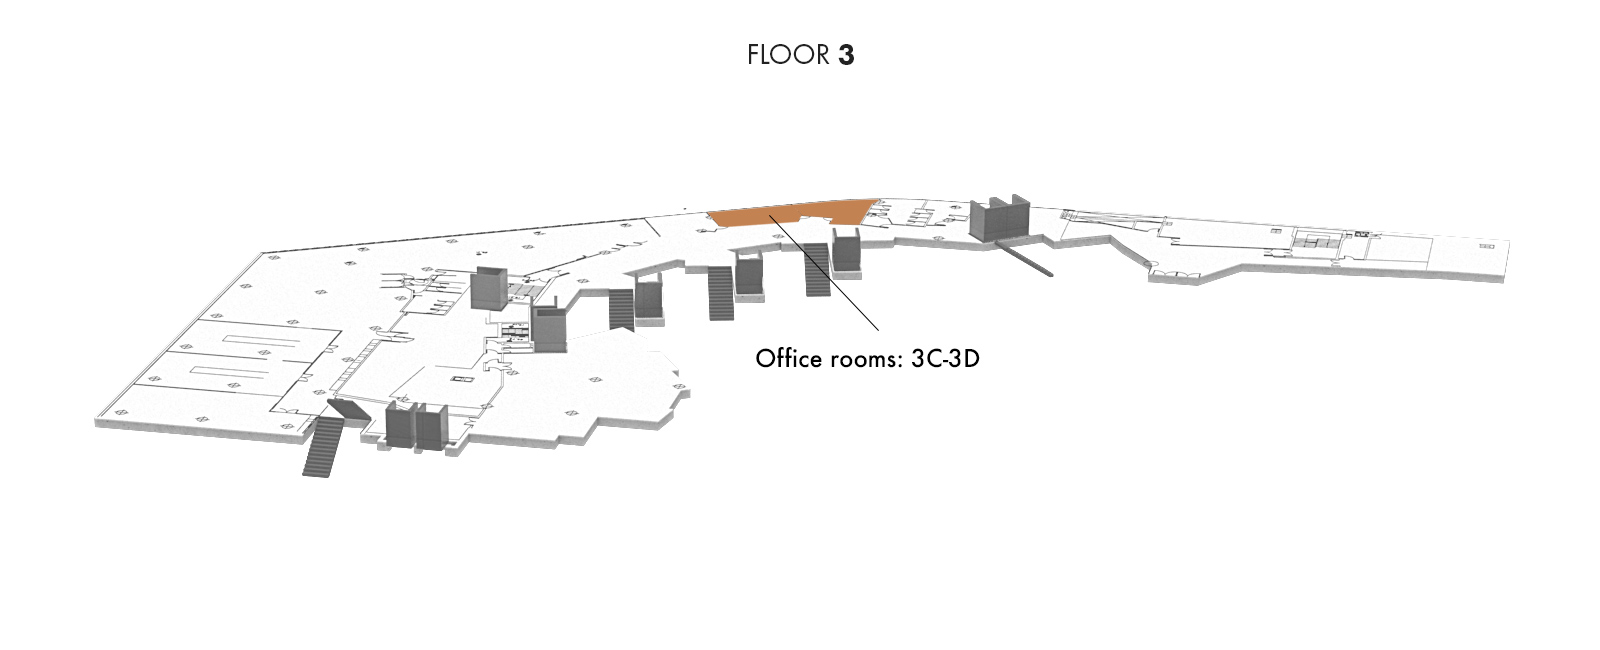 Office rooms: 3C-3D, Floor 3 | Palacio Euskalduna Jauregia